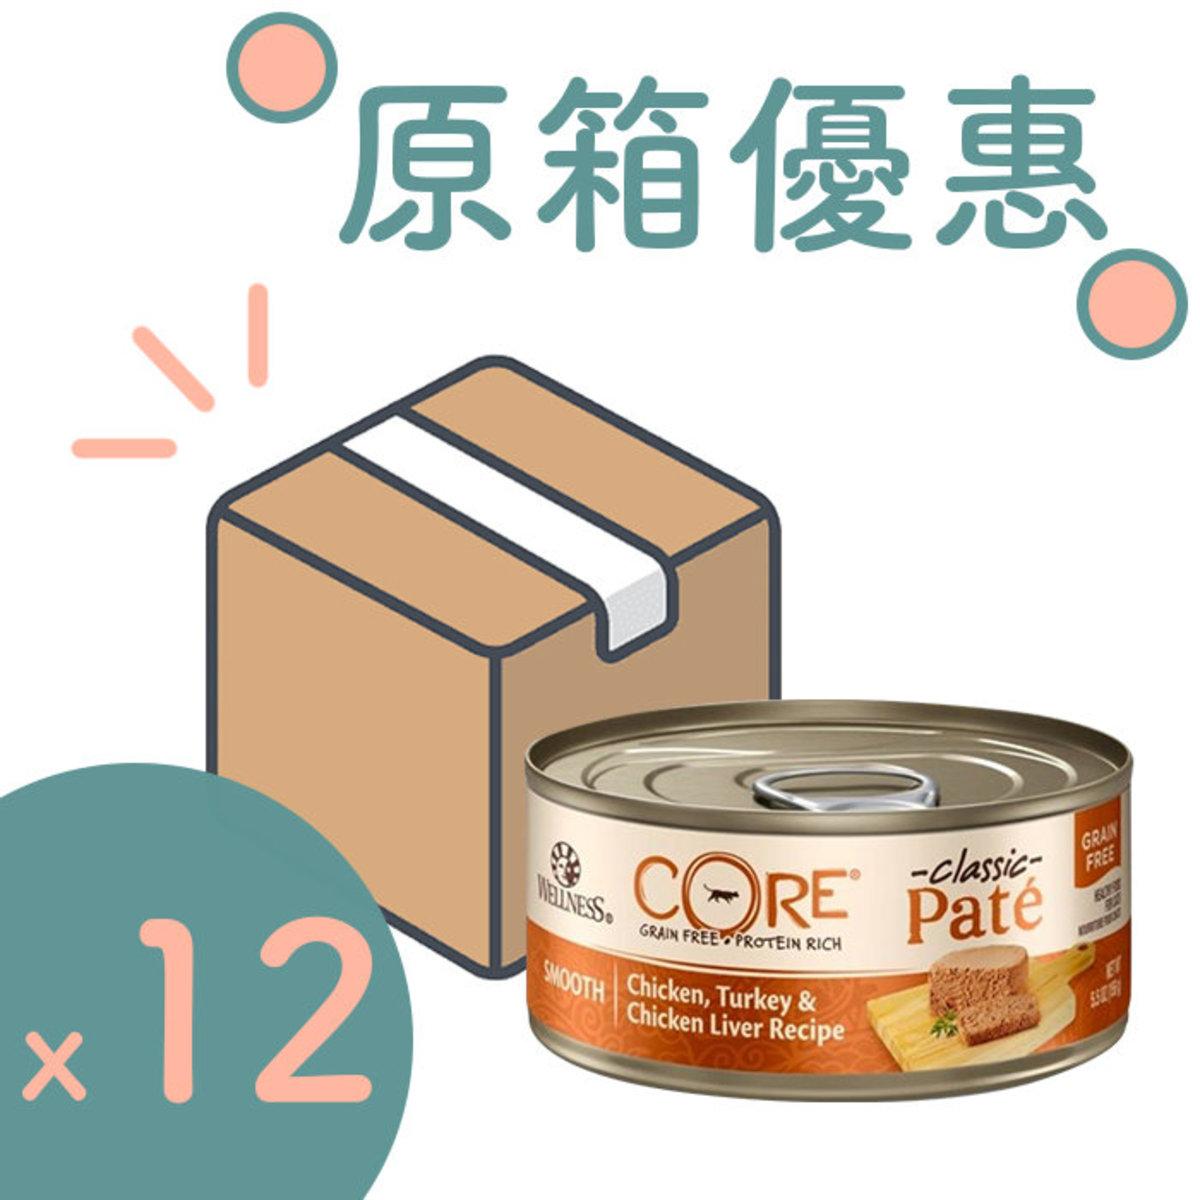 [12PCS SET] Core Classic Pate Grain Free Smooth Chicken; Turkey & Chicken Liver Recipe 5.5oz